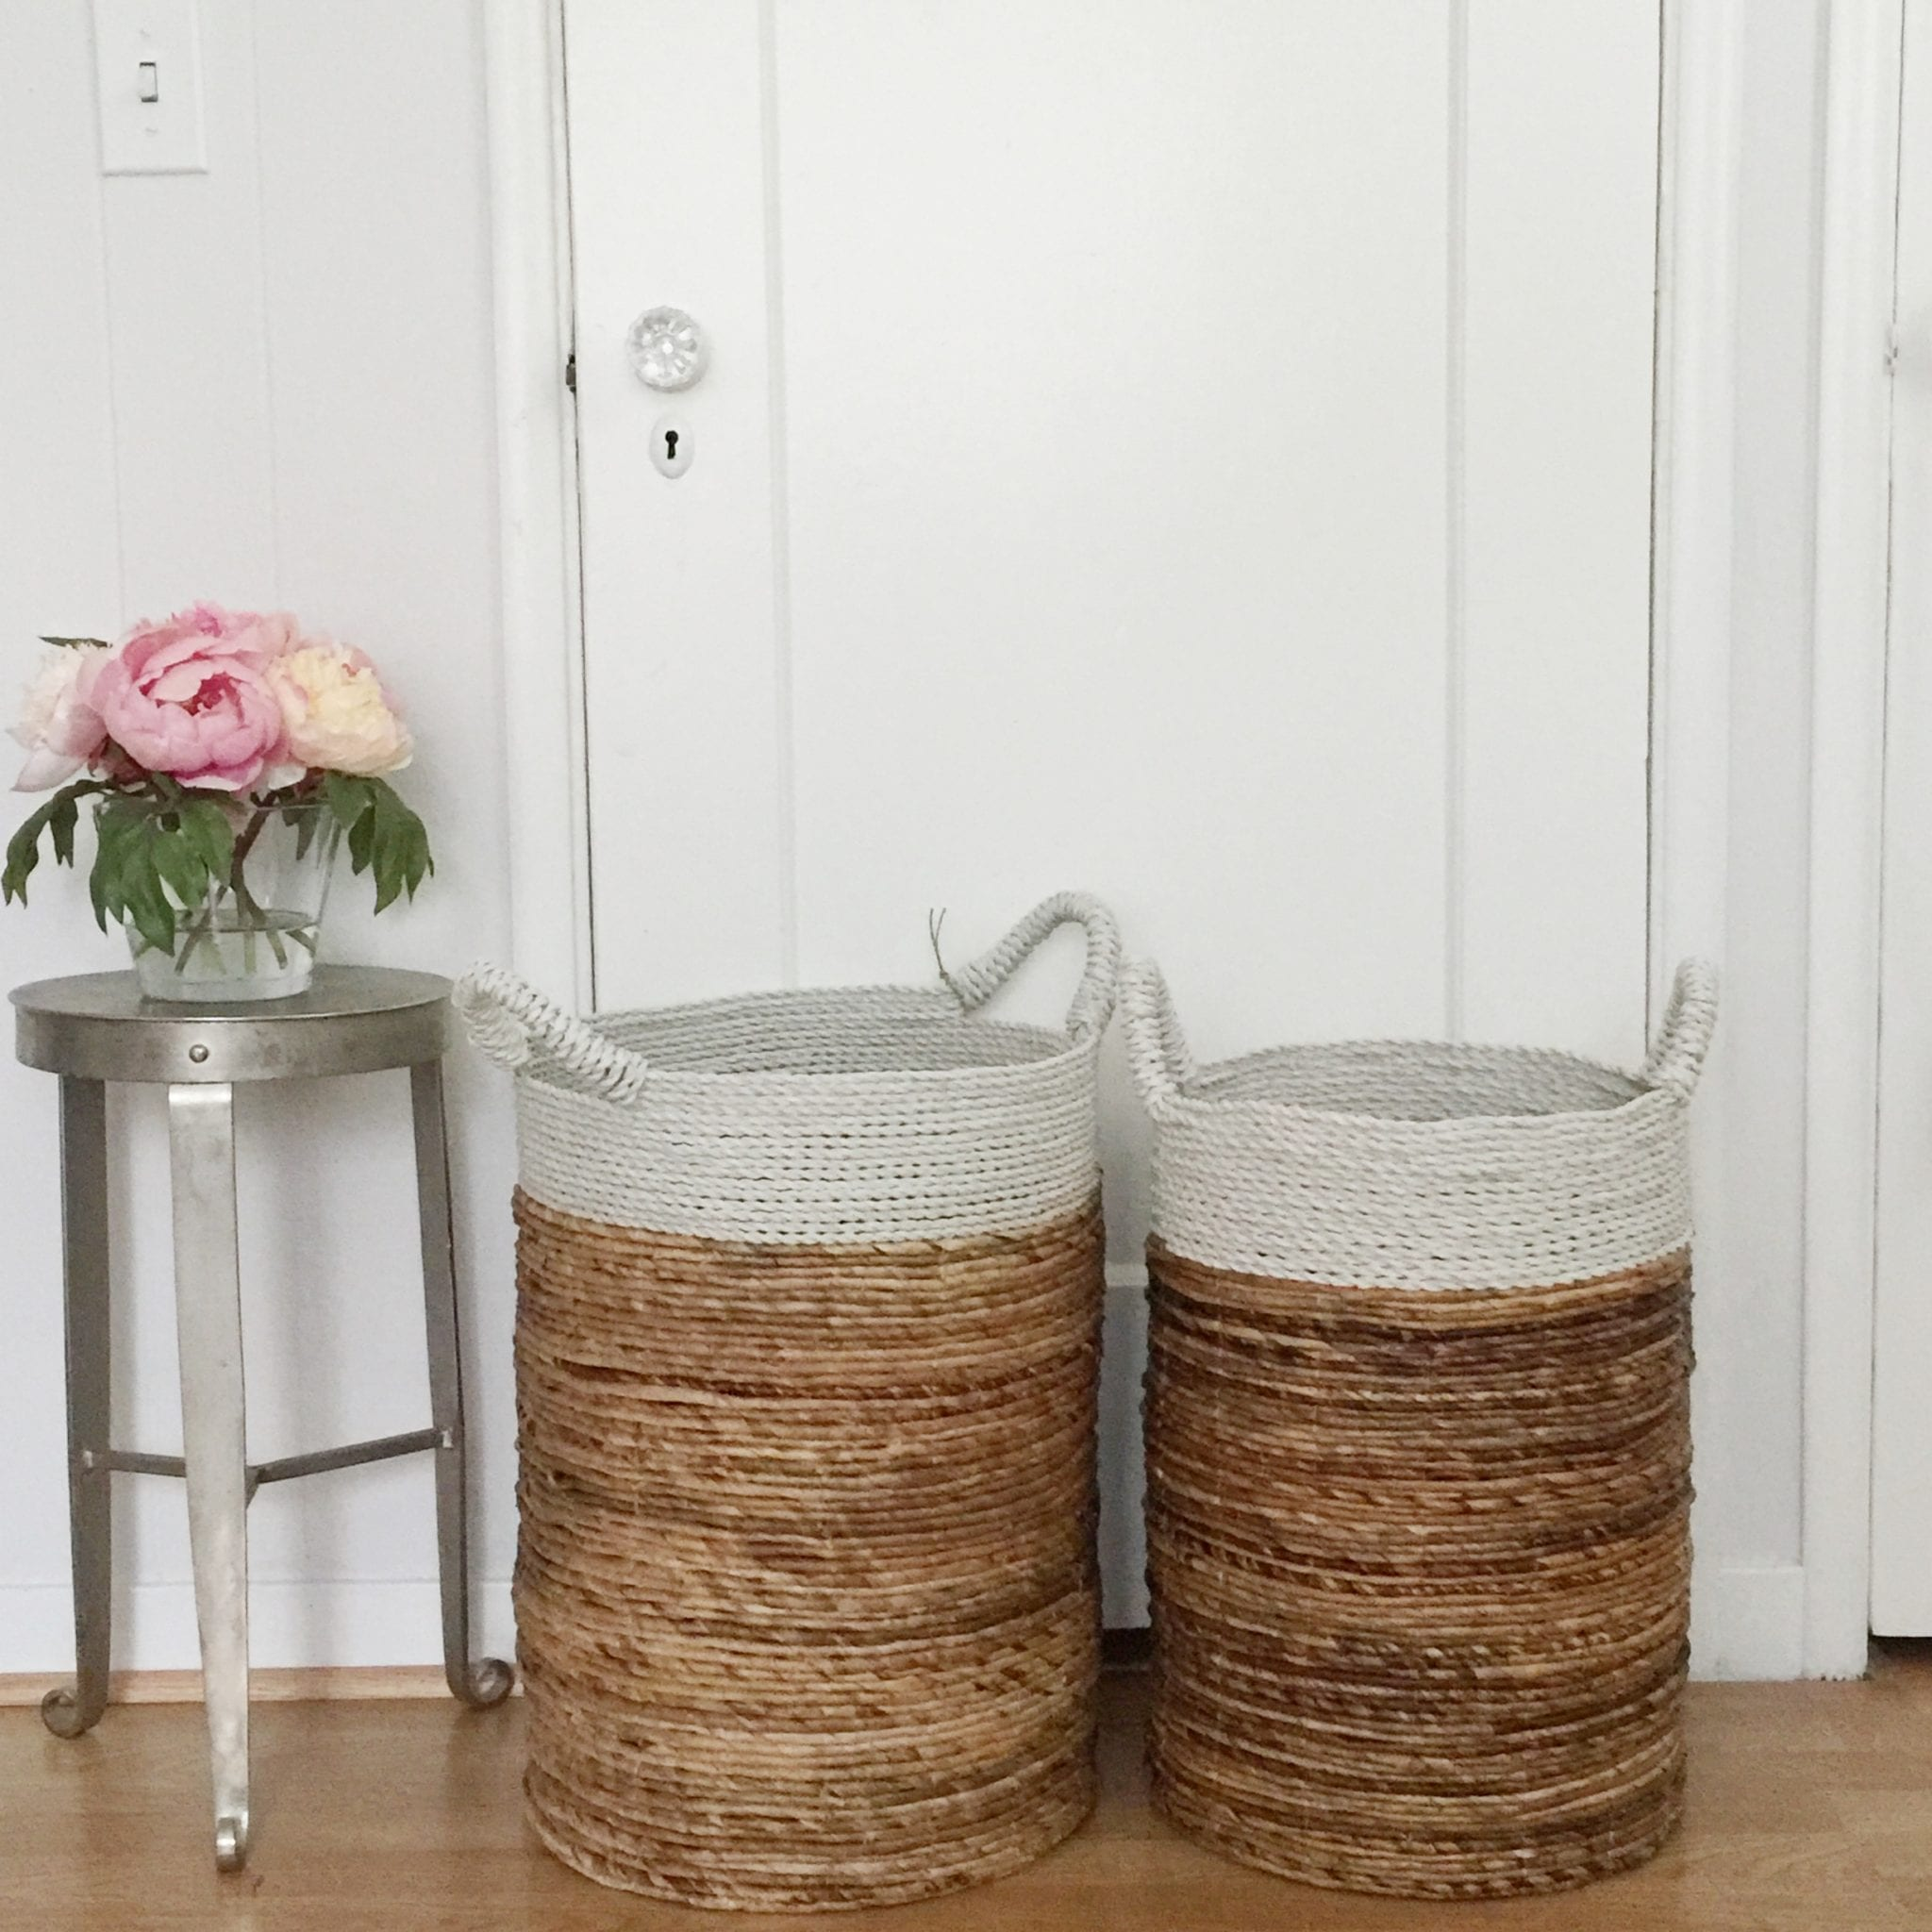 woven basket storage